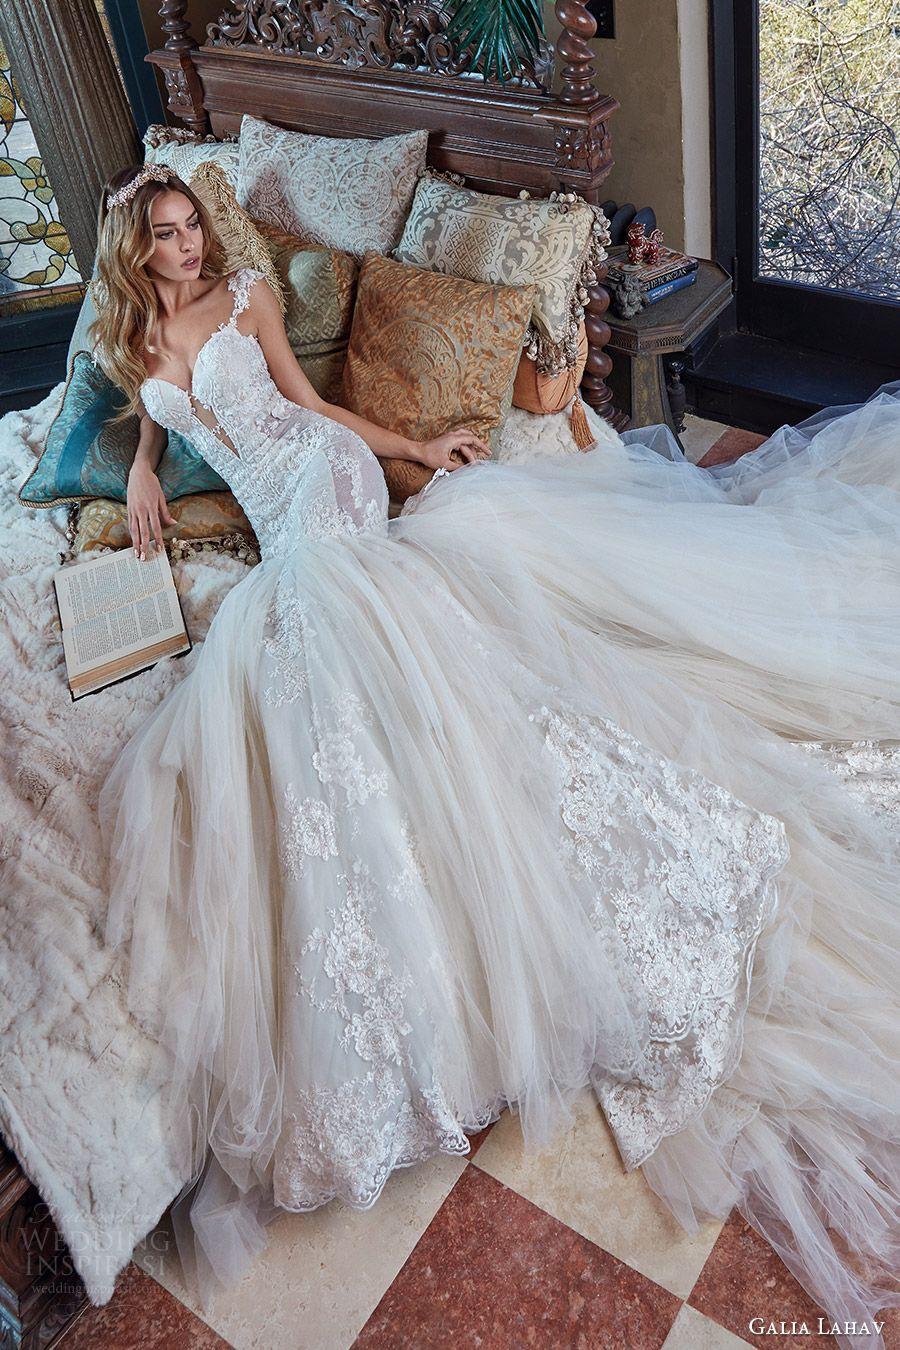 Lace mermaid wedding gowns with long trains  Galia Lahav Spring  Couture Wedding Dresses u ucLe Secret Royal